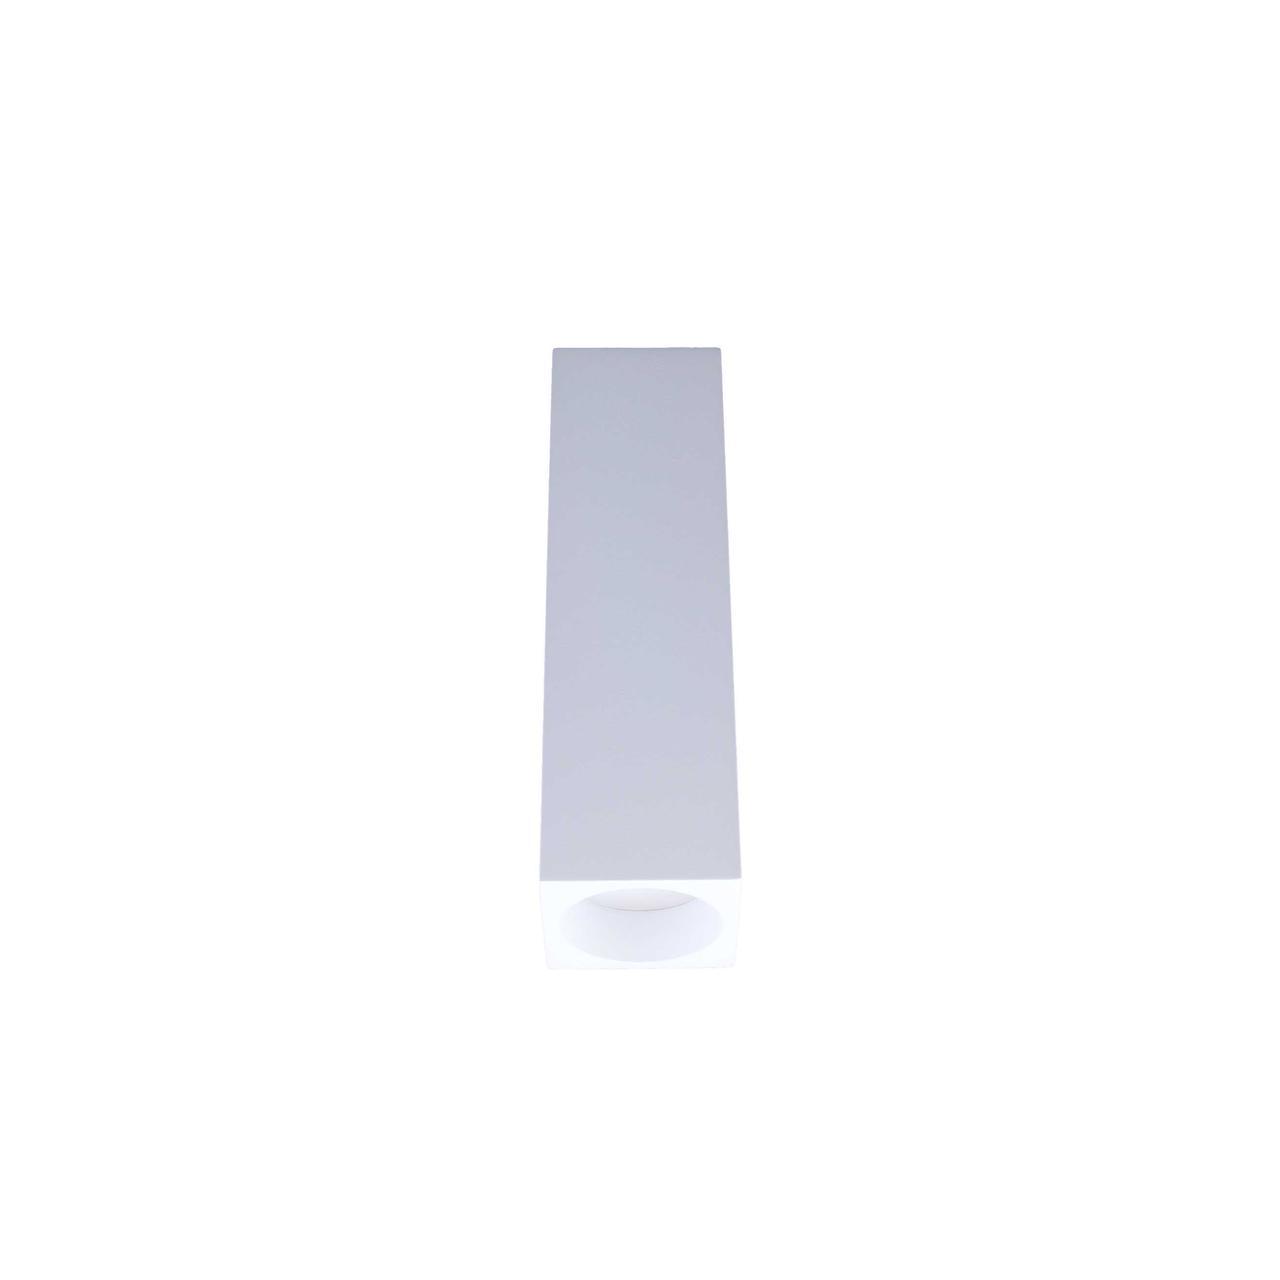 Точечный светильник Skarlat TH6803-200 WH